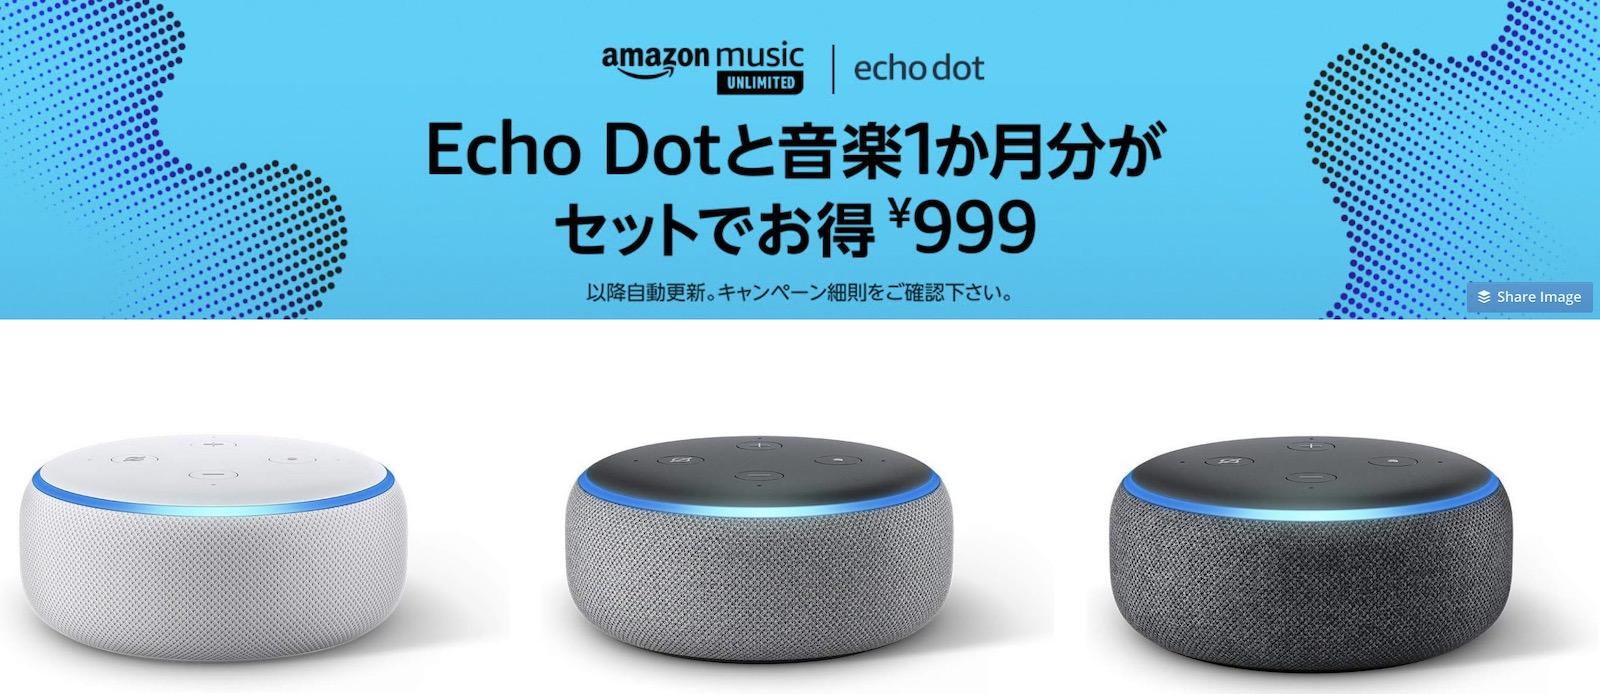 Amazon-Echo-Camapgin.jpg